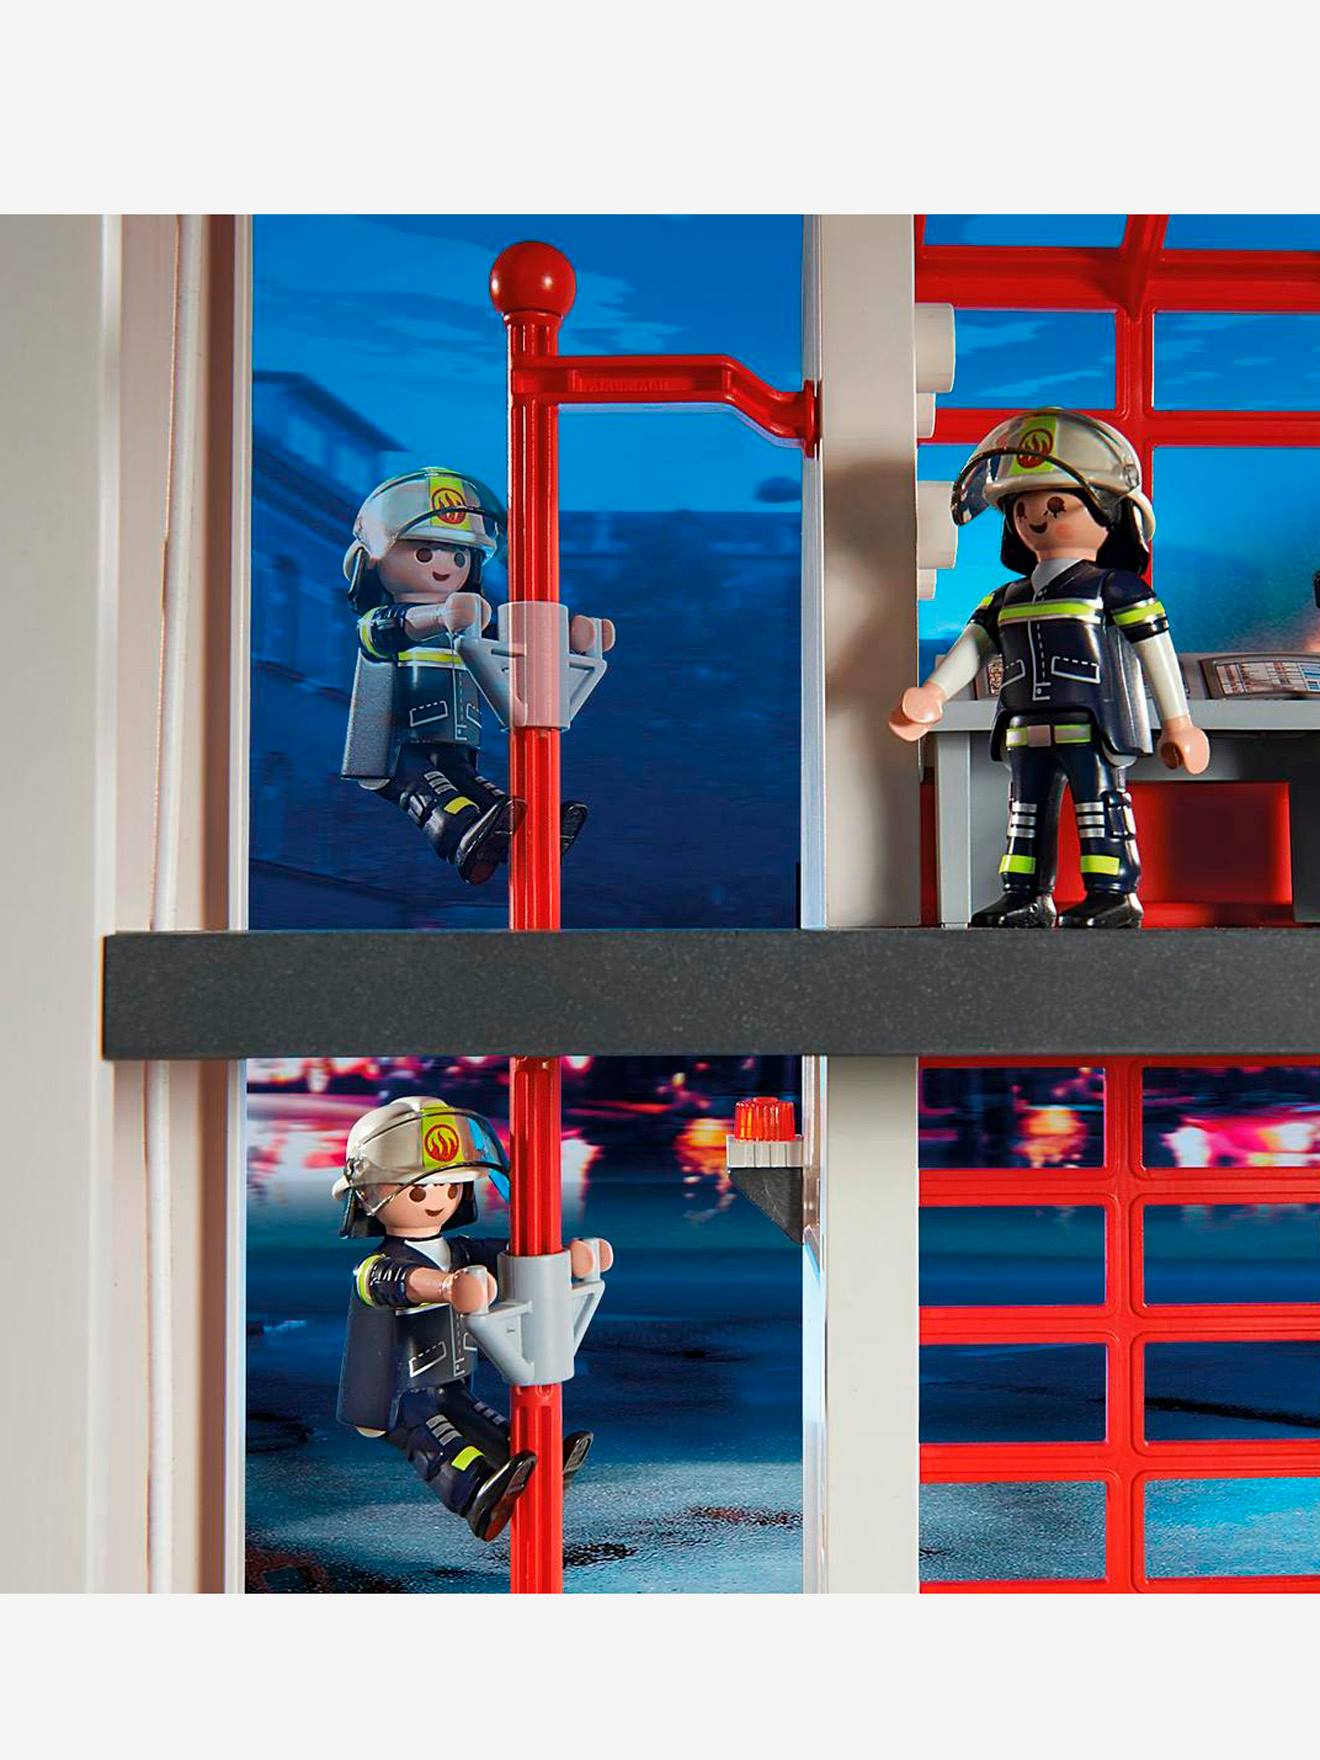 5361 Grosse Feuerwehr Zentrale Playmobil Mehrfarbig Spielzeug